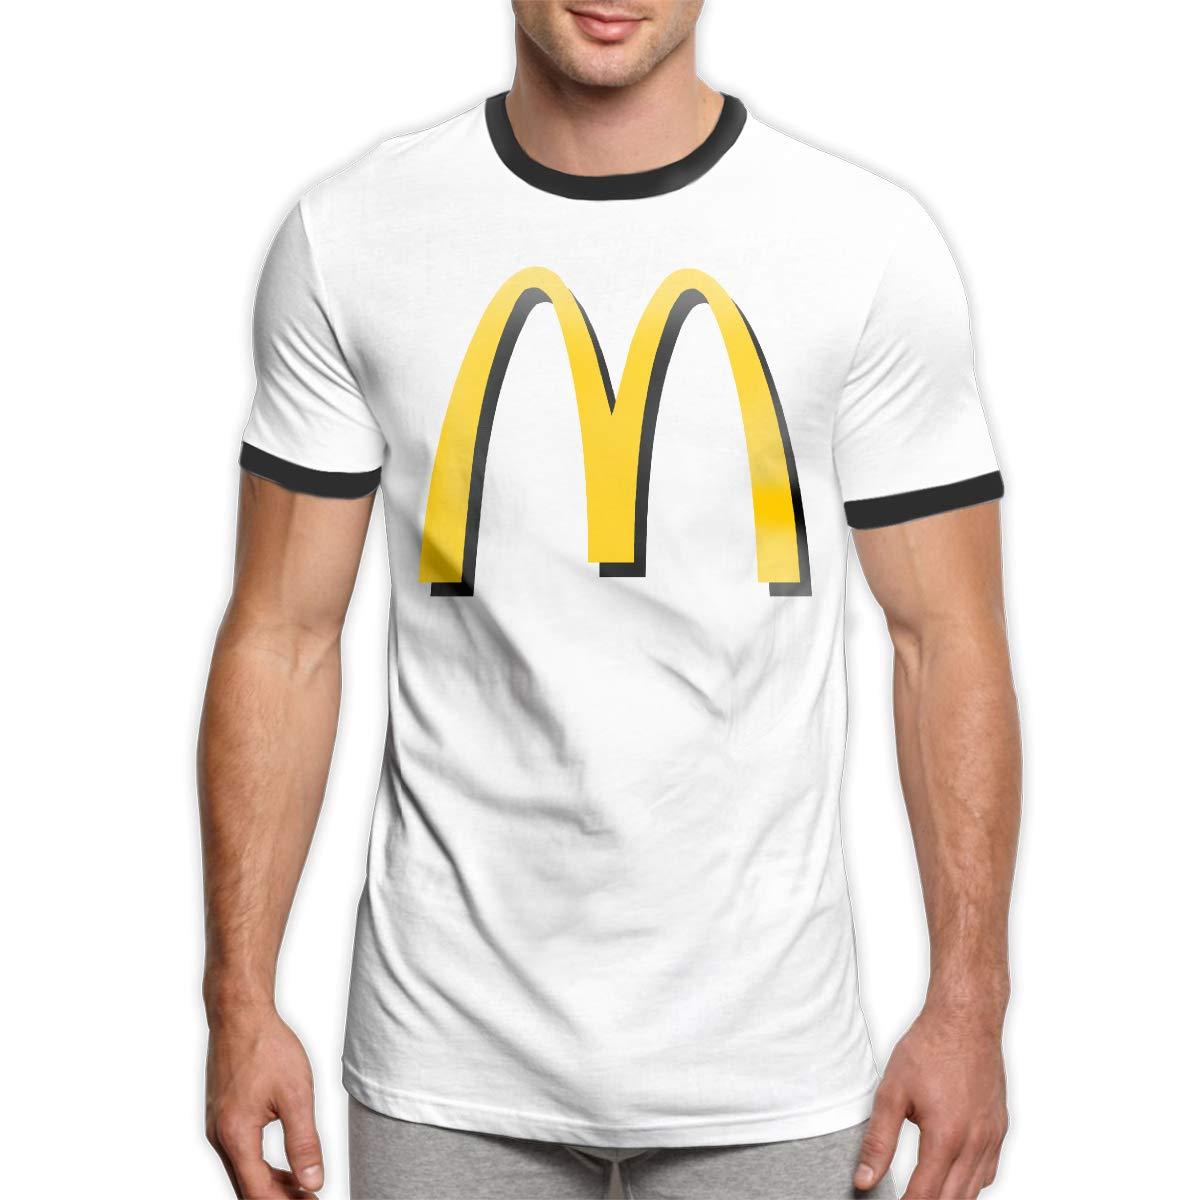 Men's Youth Boys McDonalds Logo T Shirt T-Shirt Summer Short-Sleeve Round Neck Shirts Cotton Sport Tops S